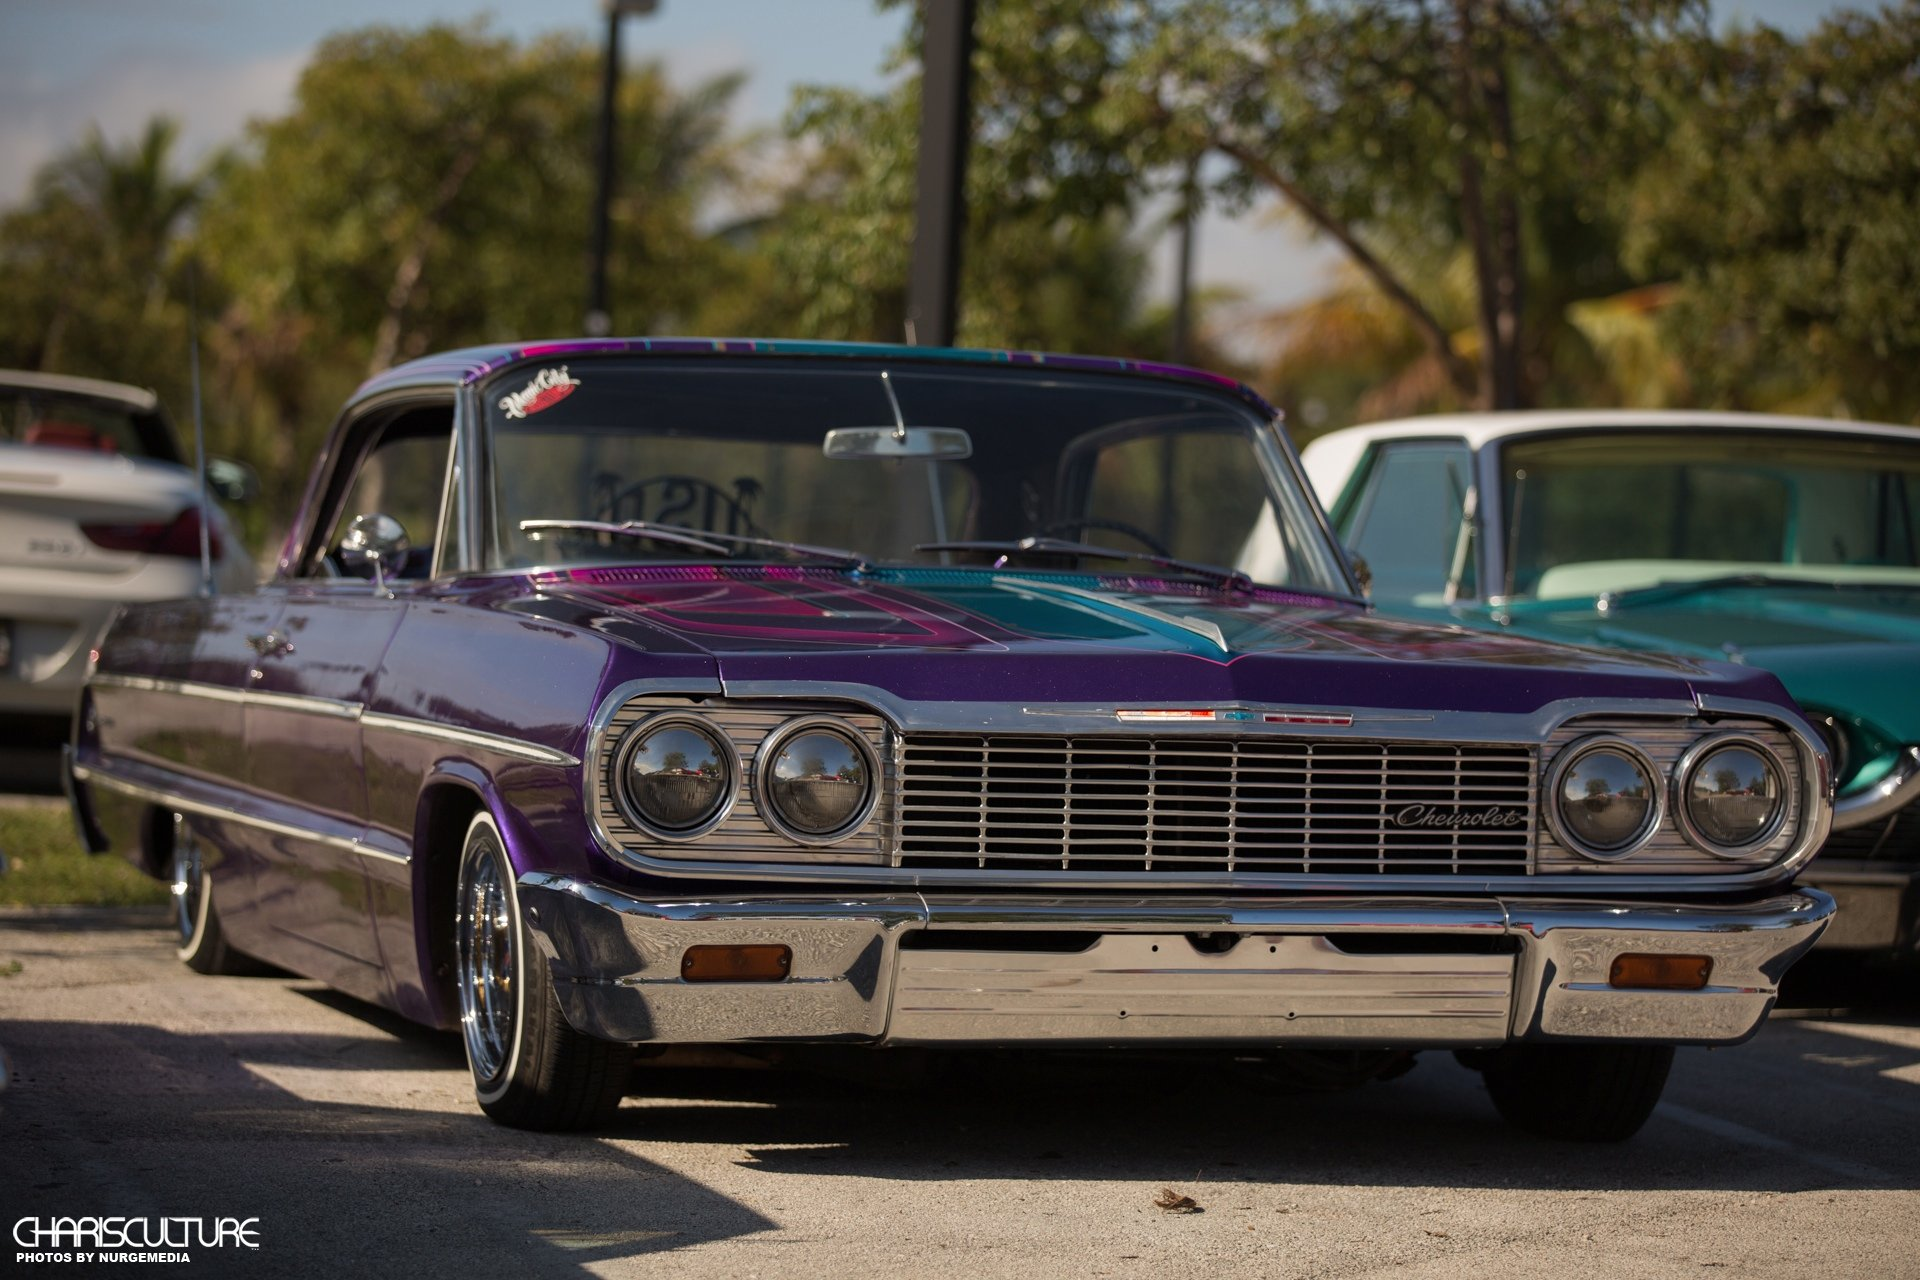 1964 Impala Lowrider Wallpaper 1920x1280